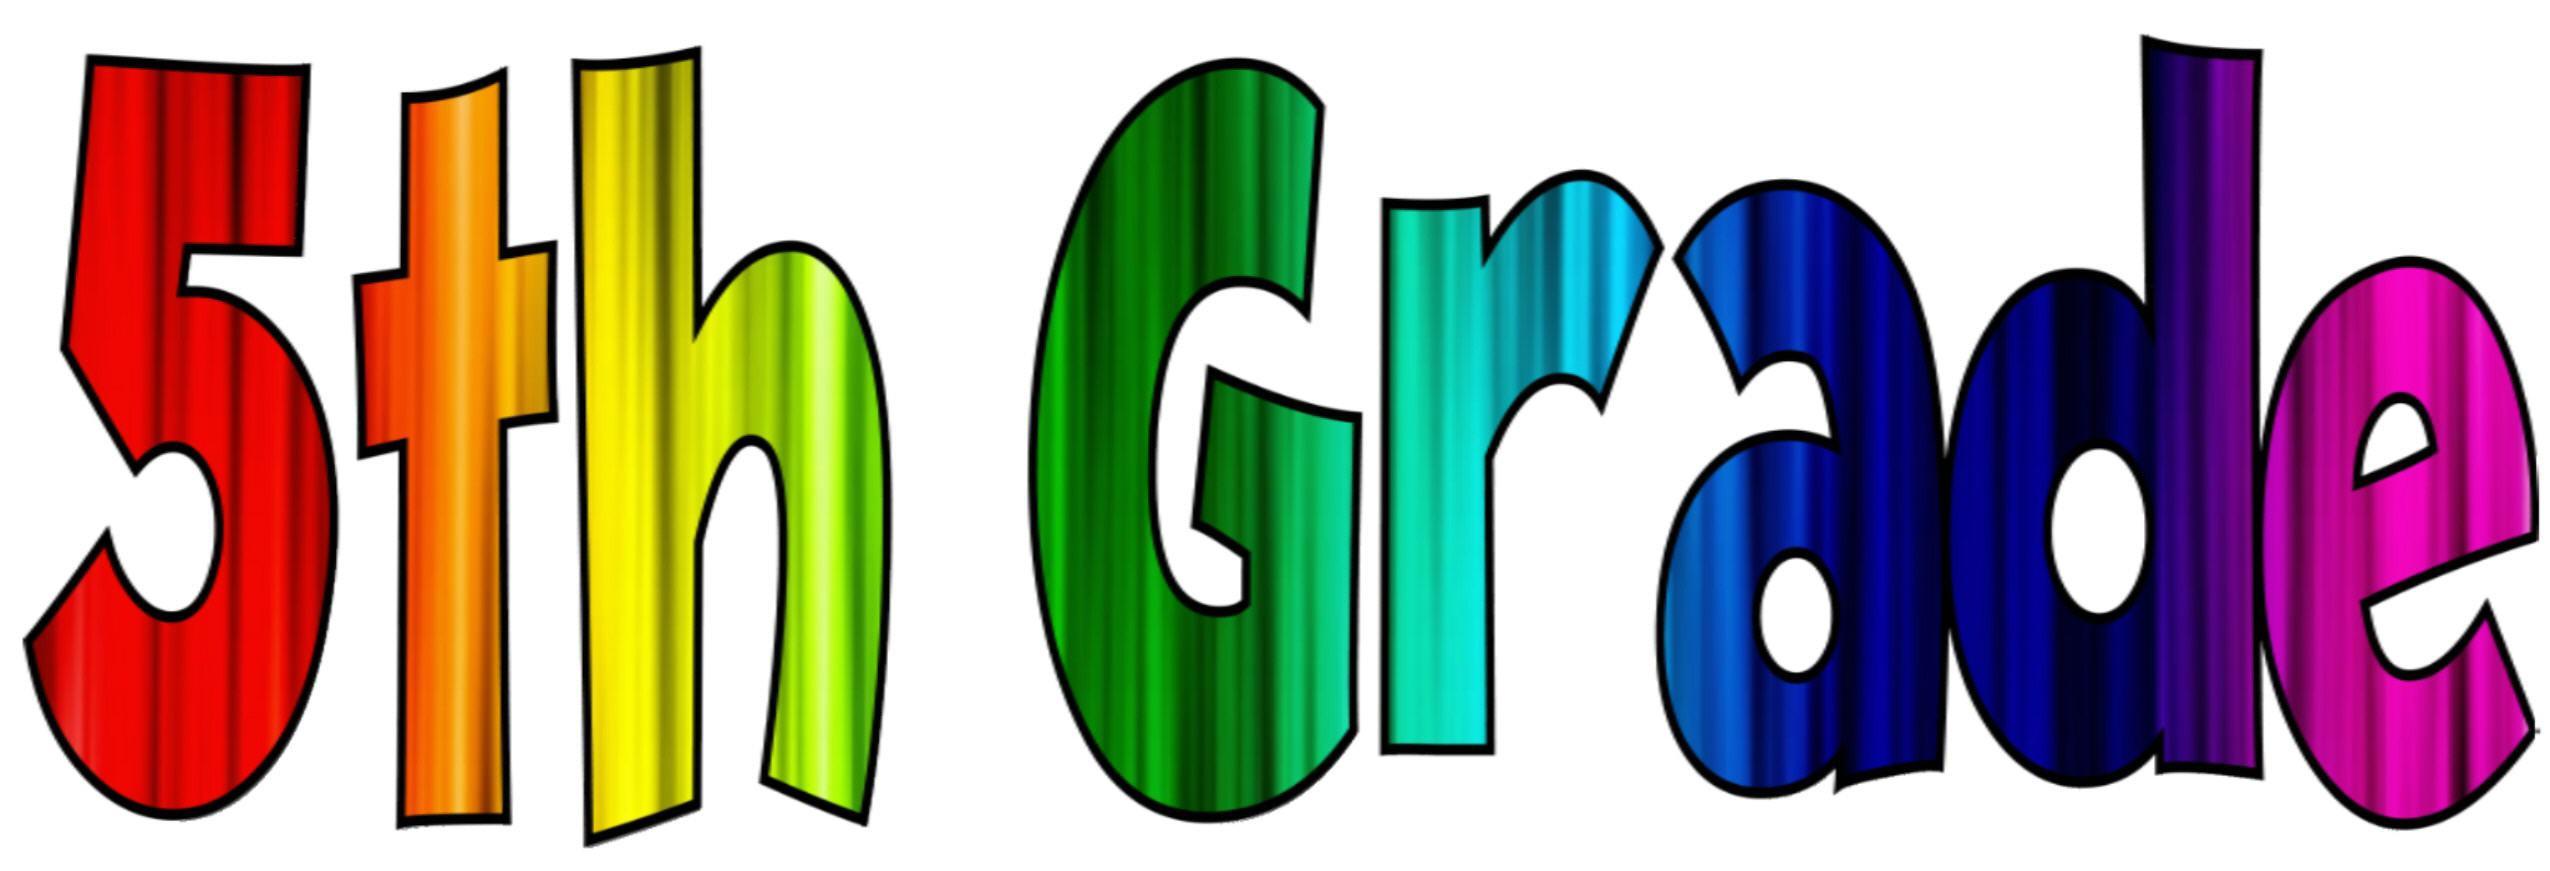 2550x871 Clip Art 5th Grade Grade Promotion Sunset Elementary Edmond Public